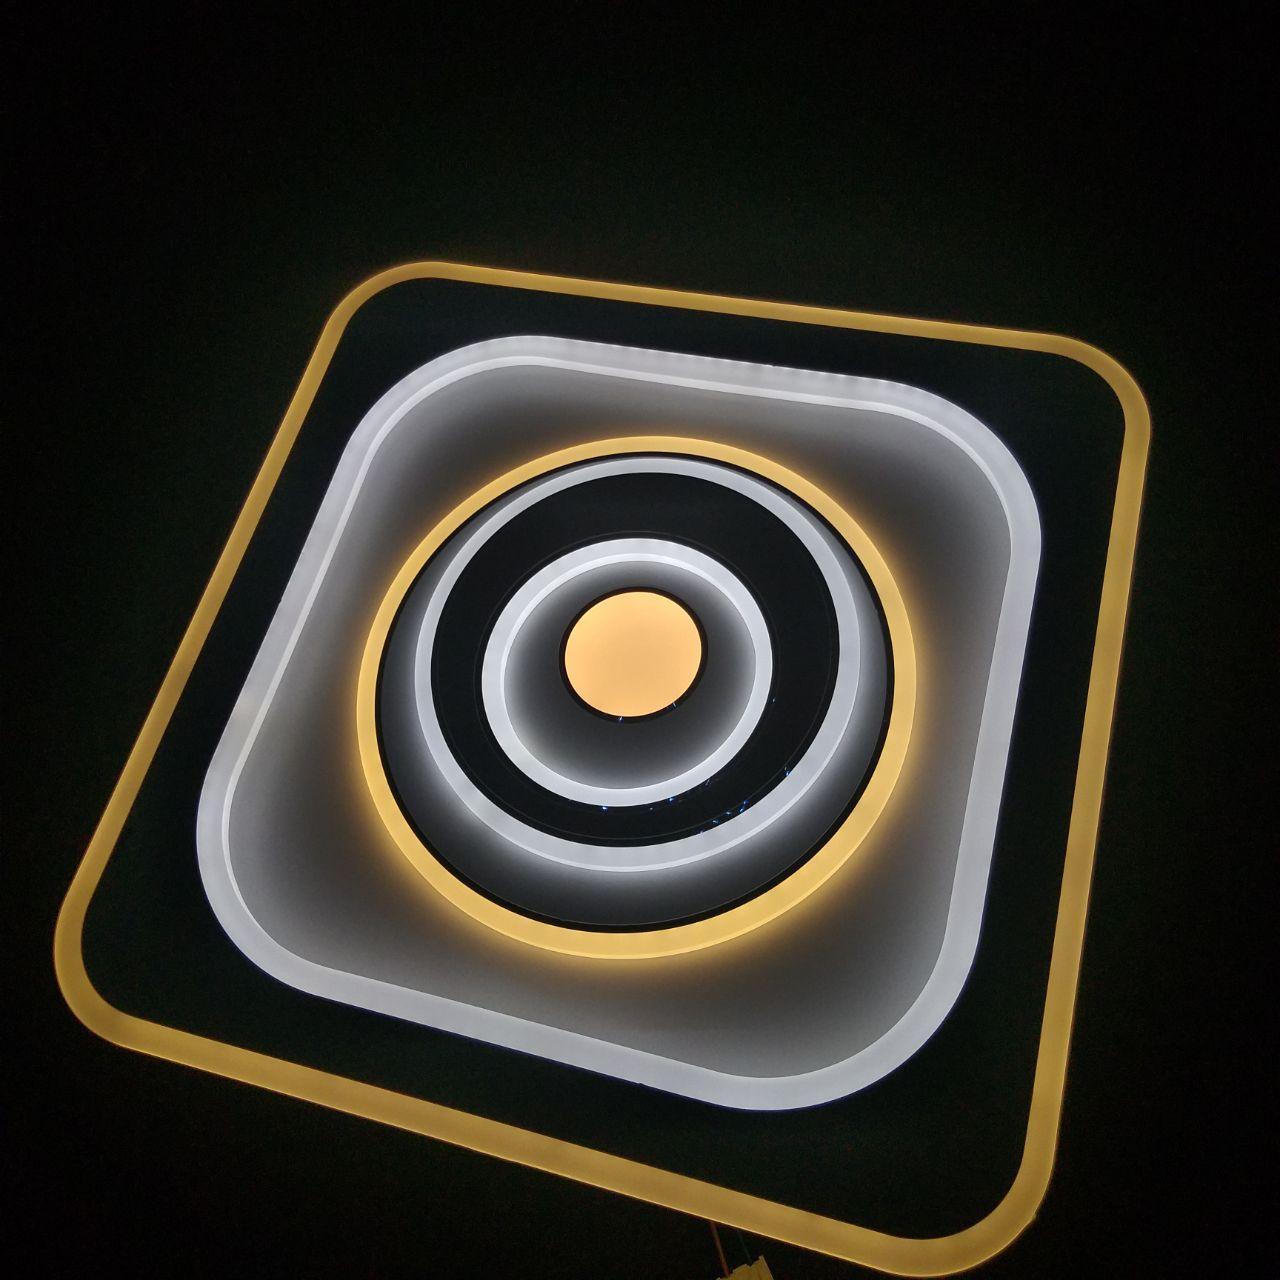 Люстра LED потолочная квадрат с кругами внутри  JLI-1809/3 500*500 102W+102W квадрат